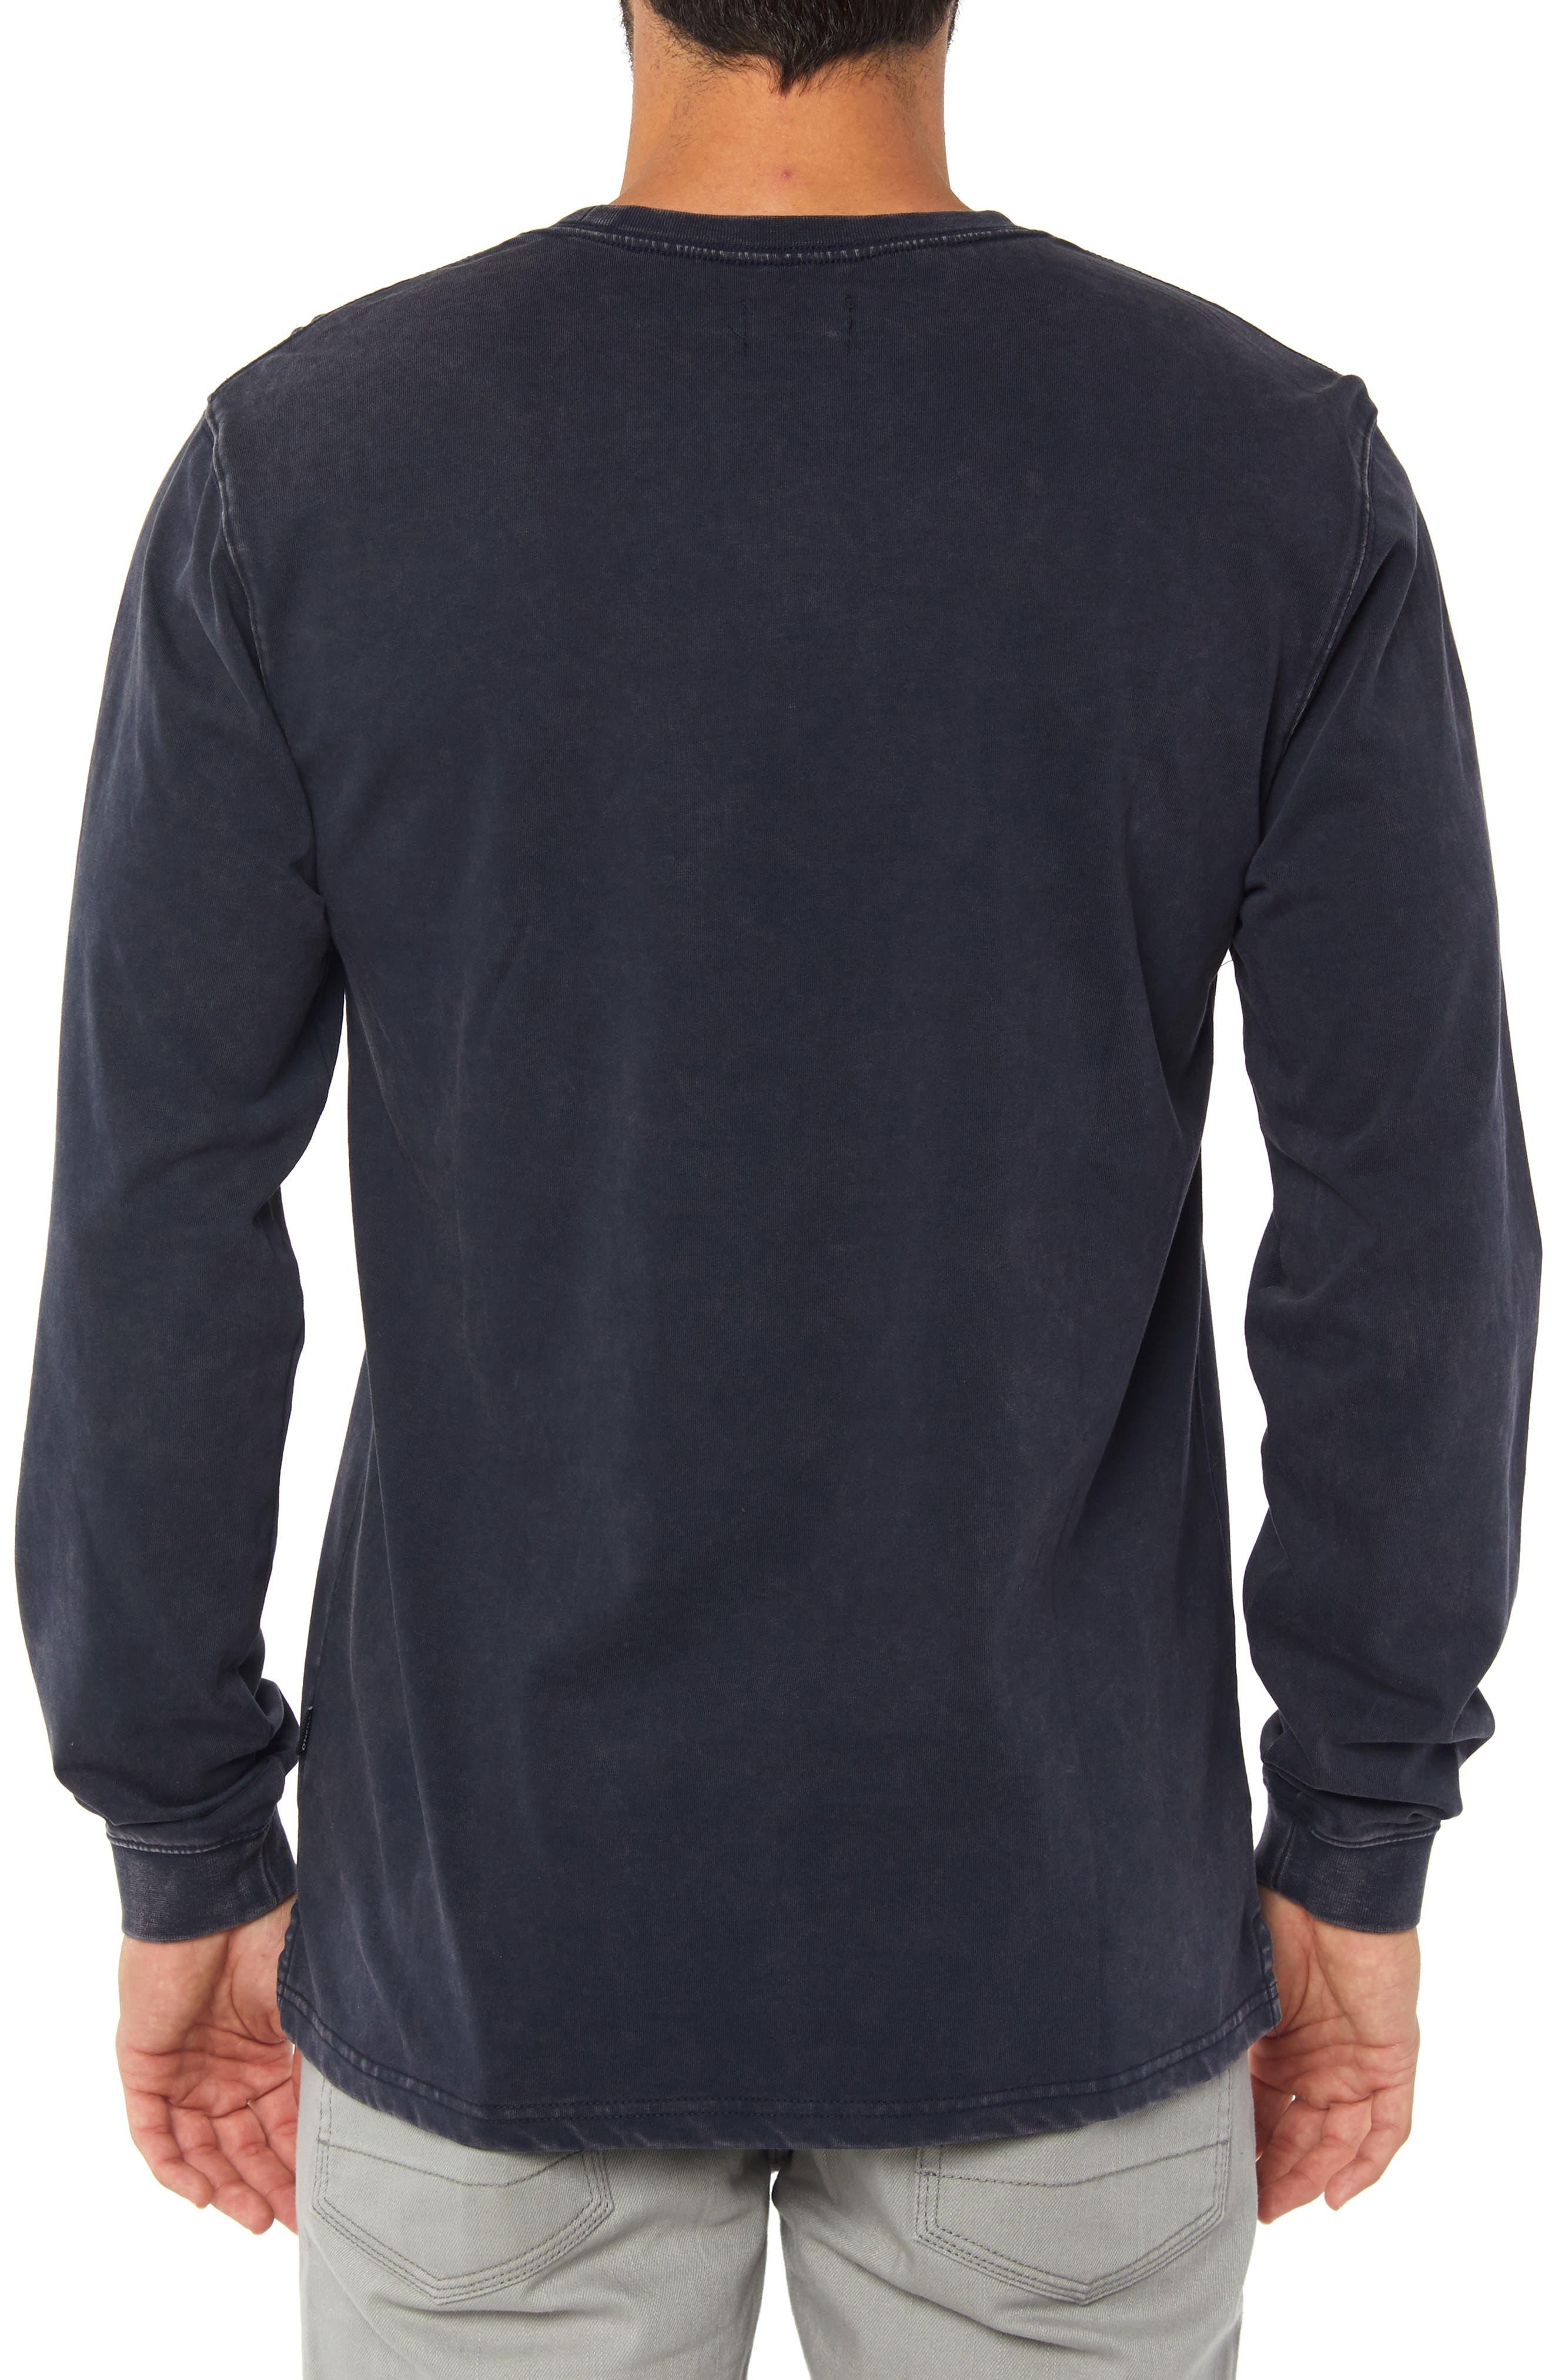 Hayward Long Sleeve T-Shirt,                             Alternate thumbnail 2, color,                             DARK NAVY